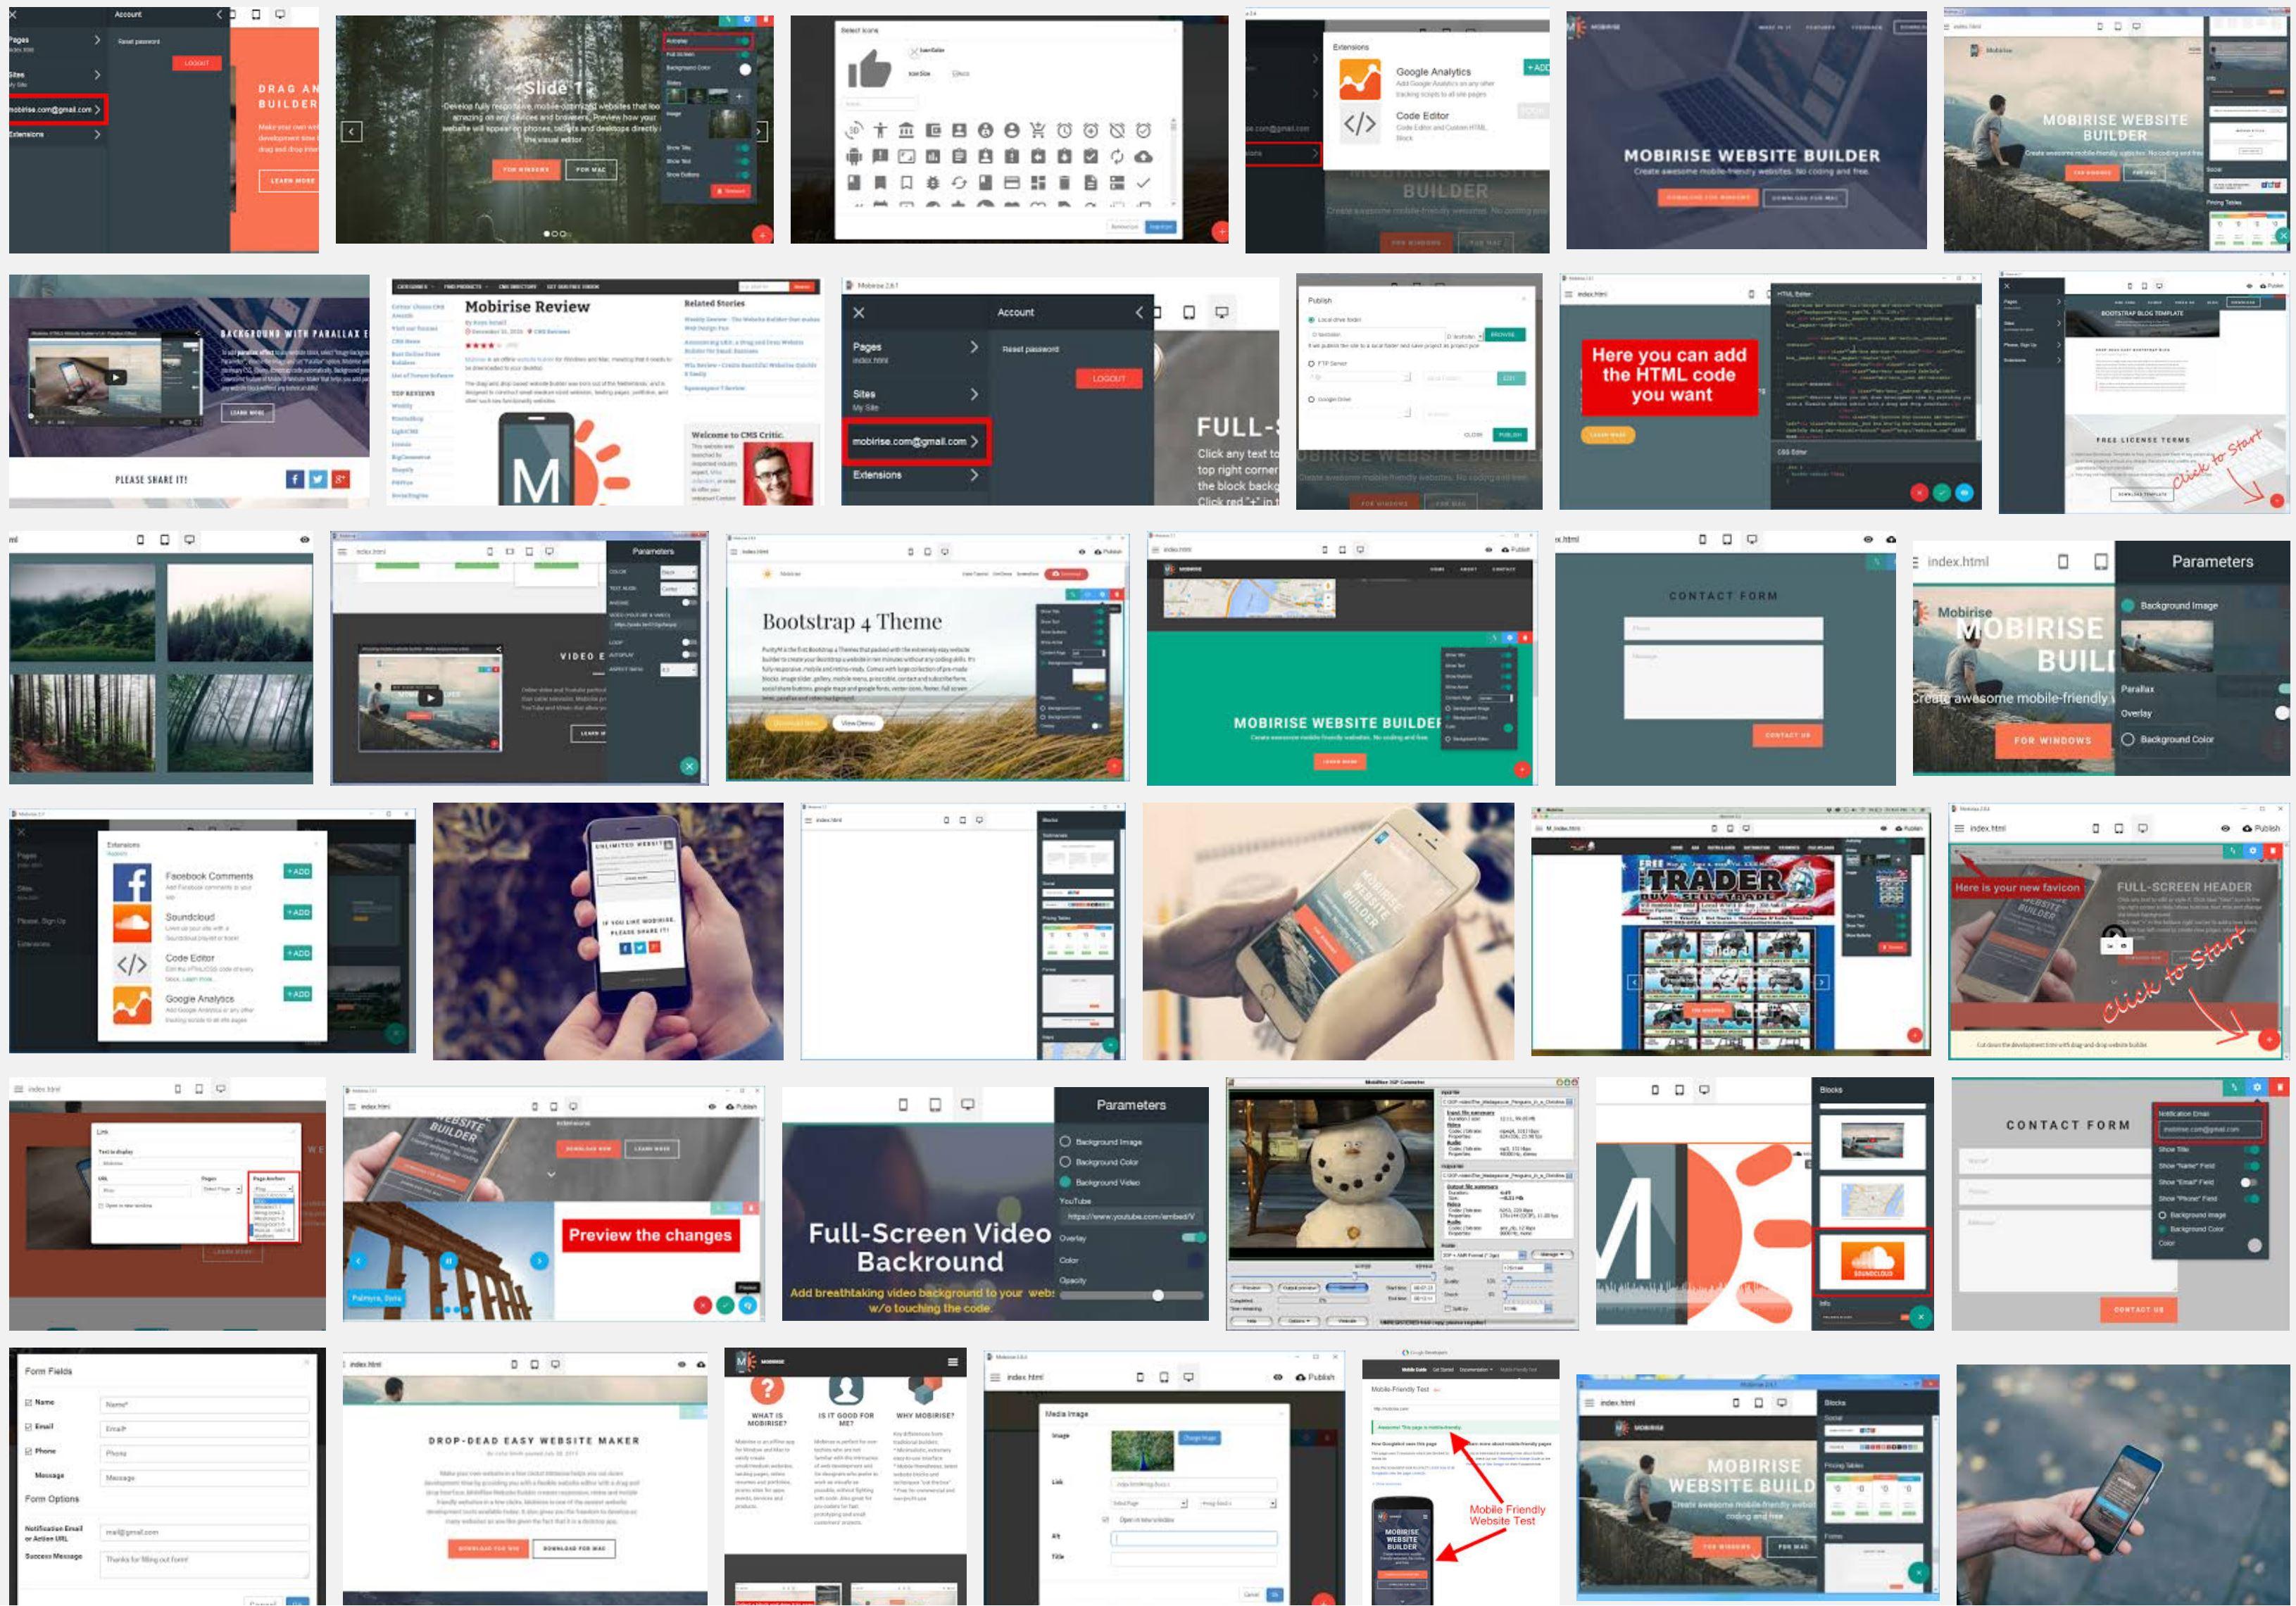 bootstrap web builder